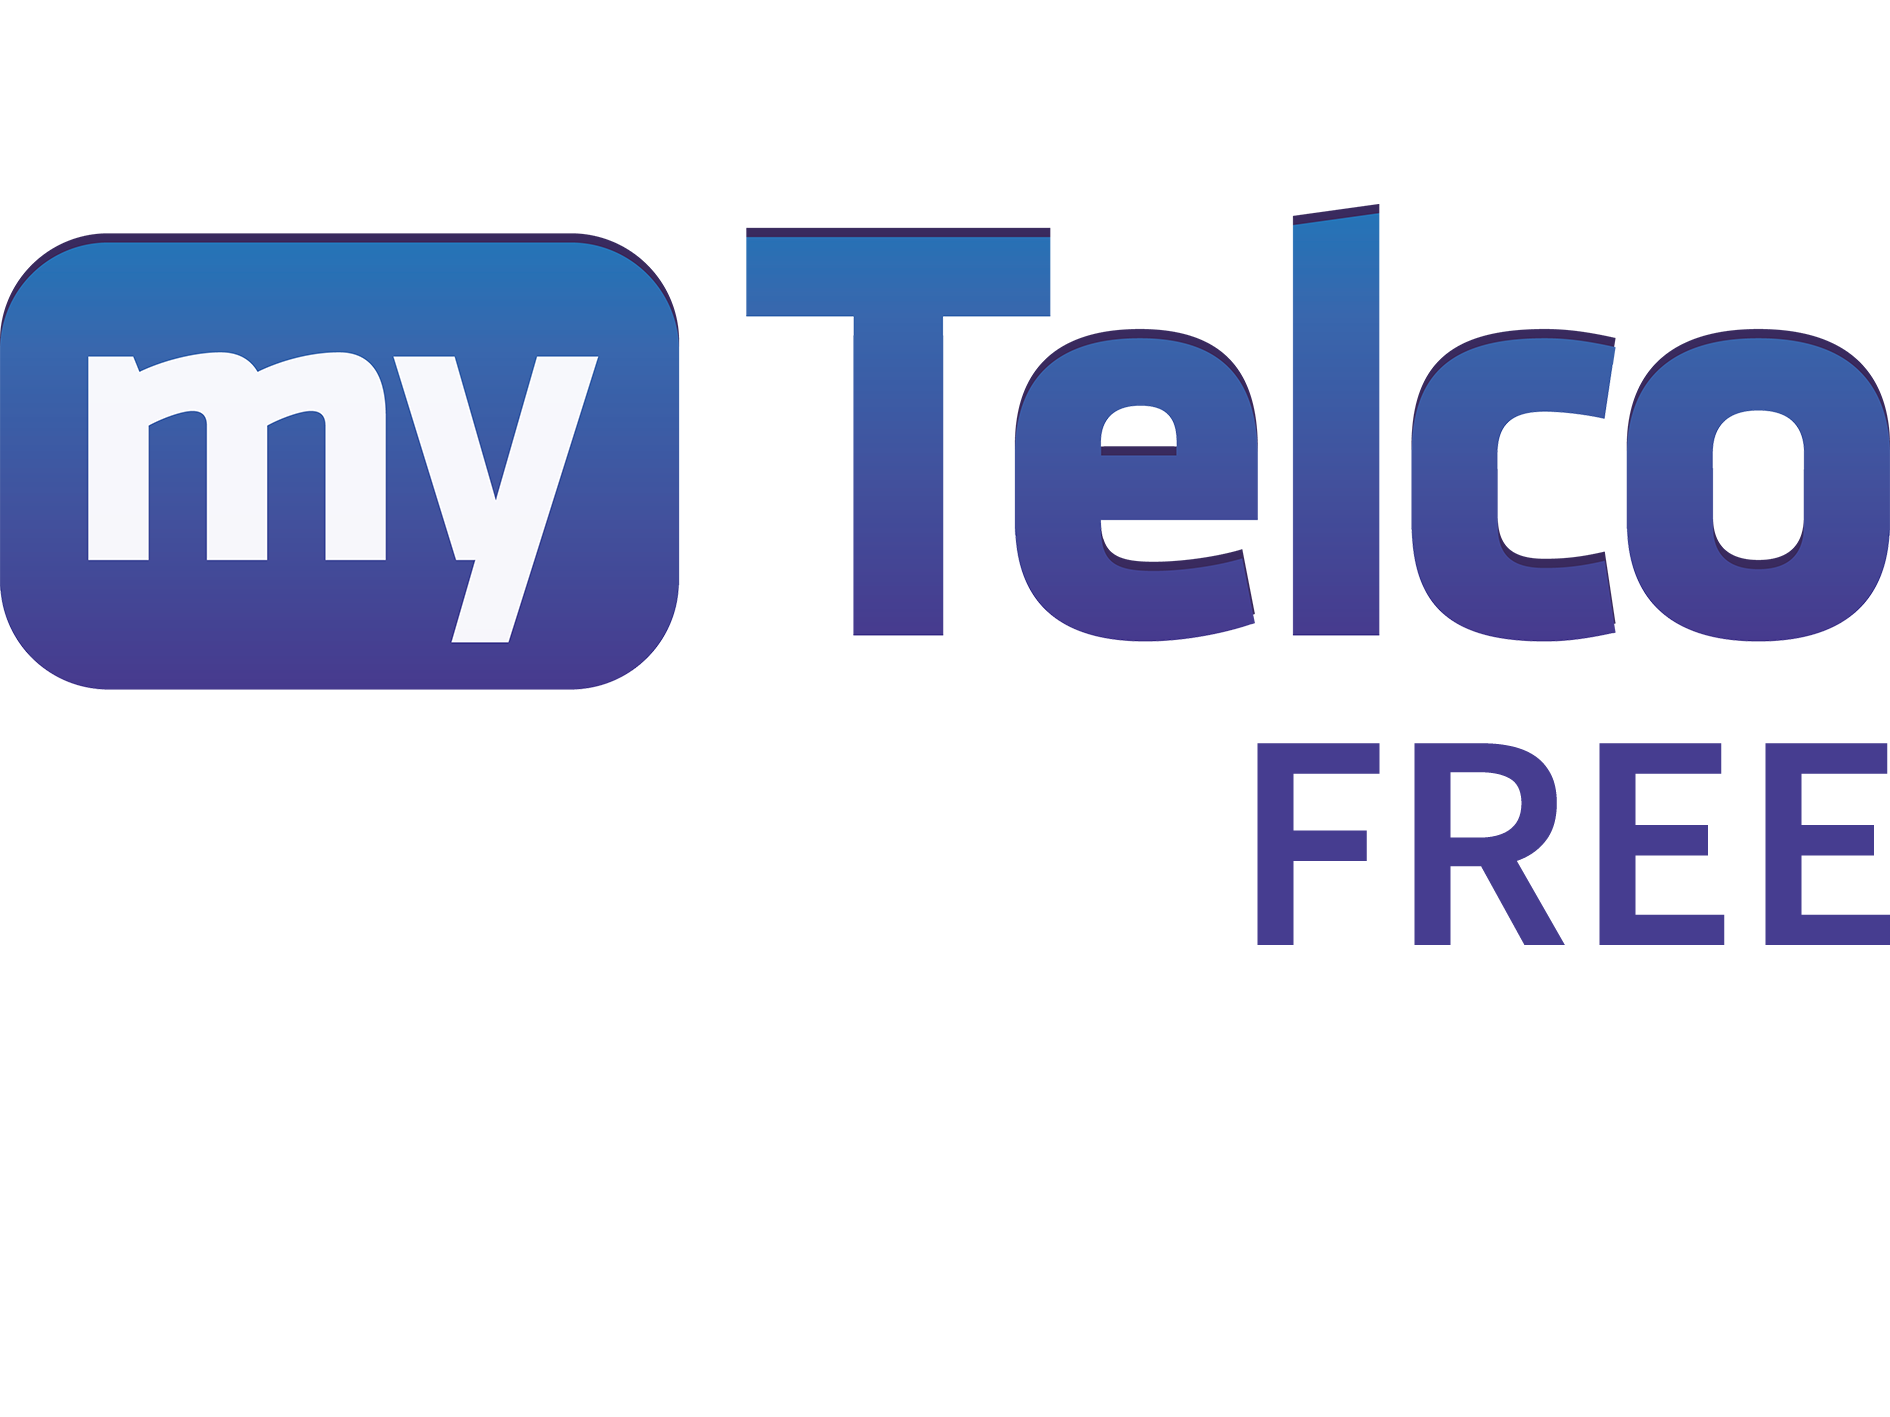 Logo myTelco Free